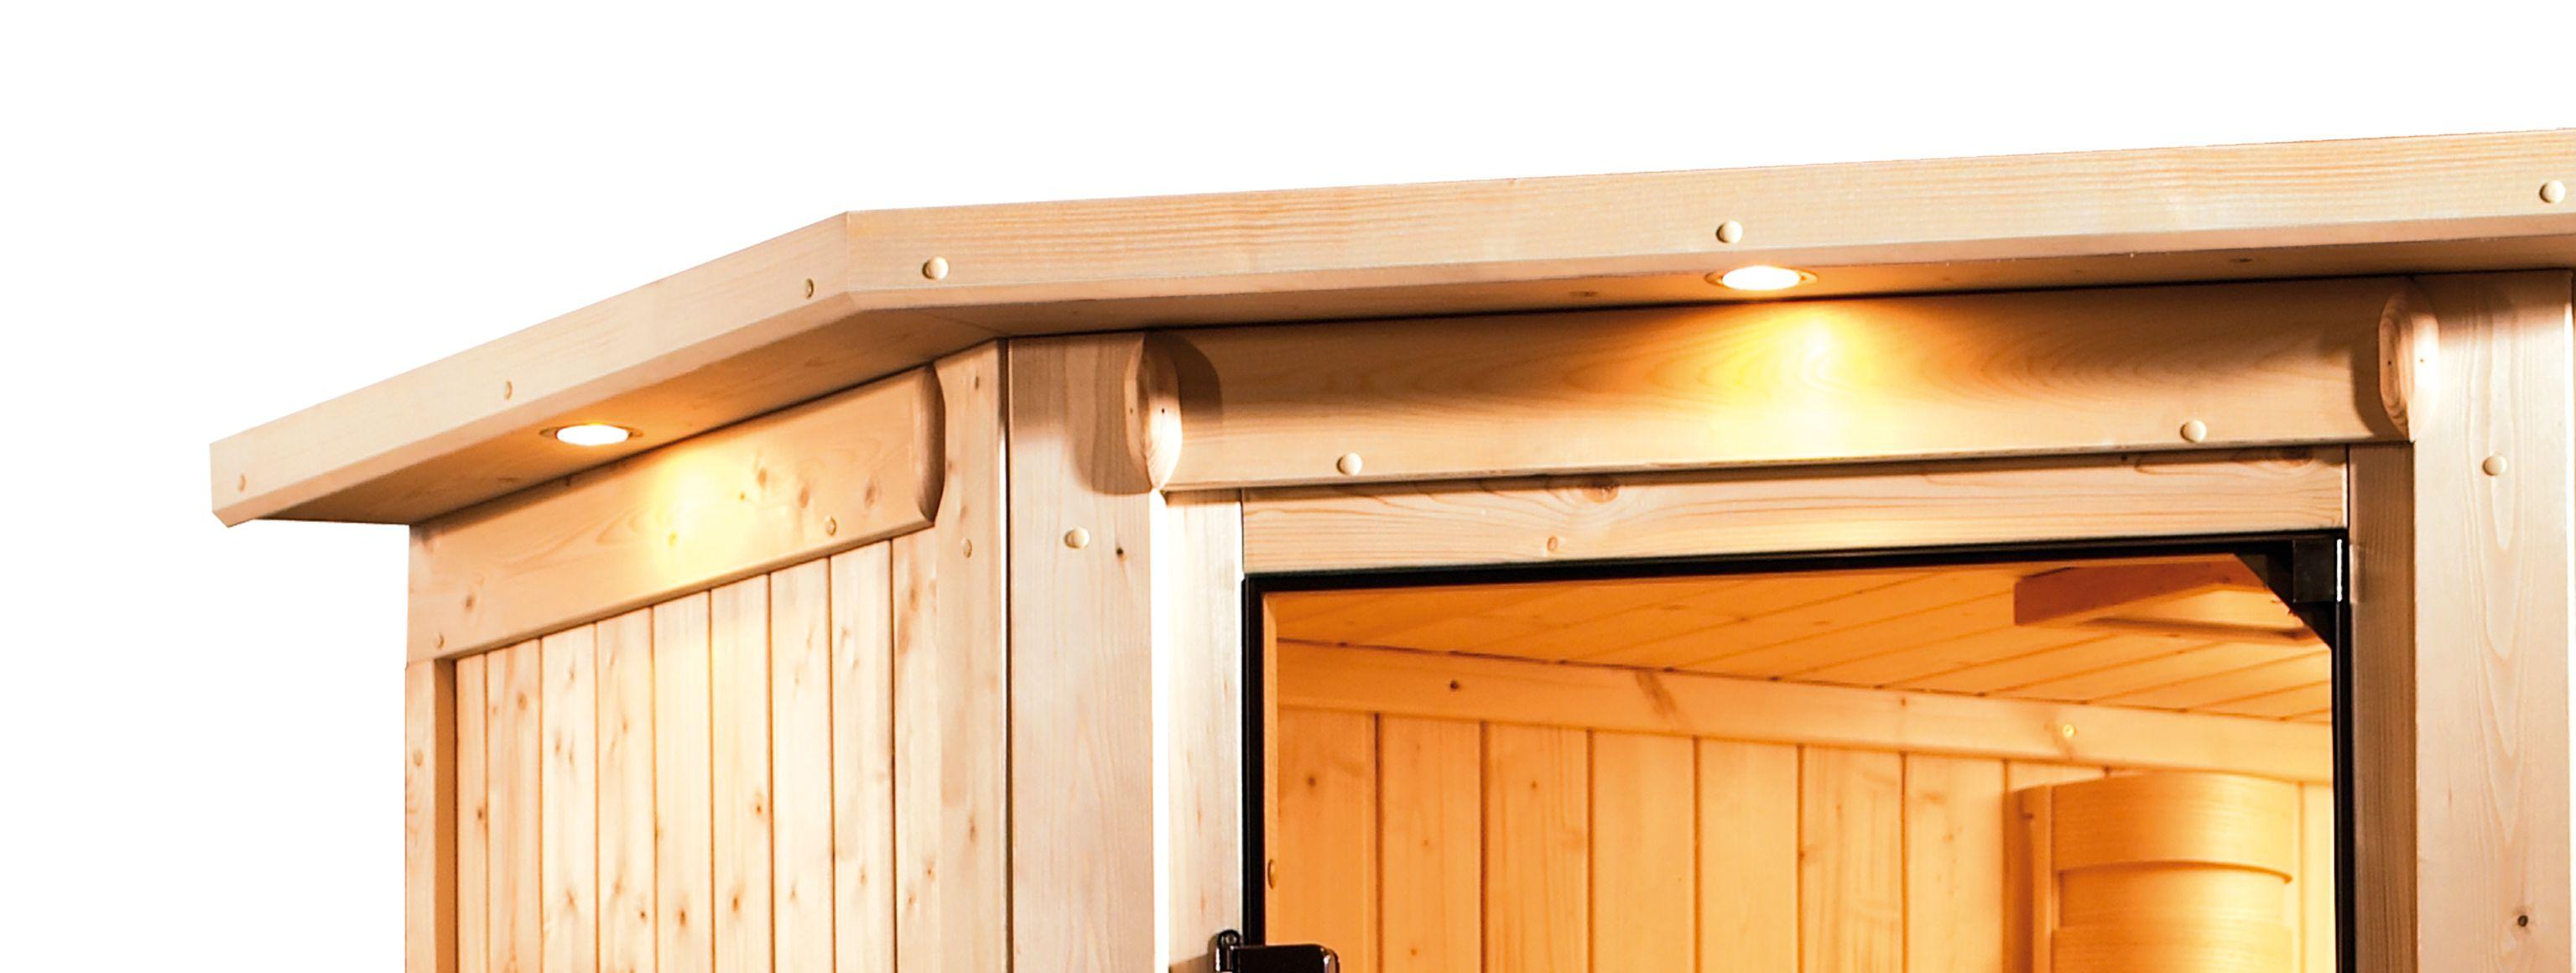 Woodfeeling Sauna Jara 38mm Dachkranz Saunaofen 9 kW extern Bild 3